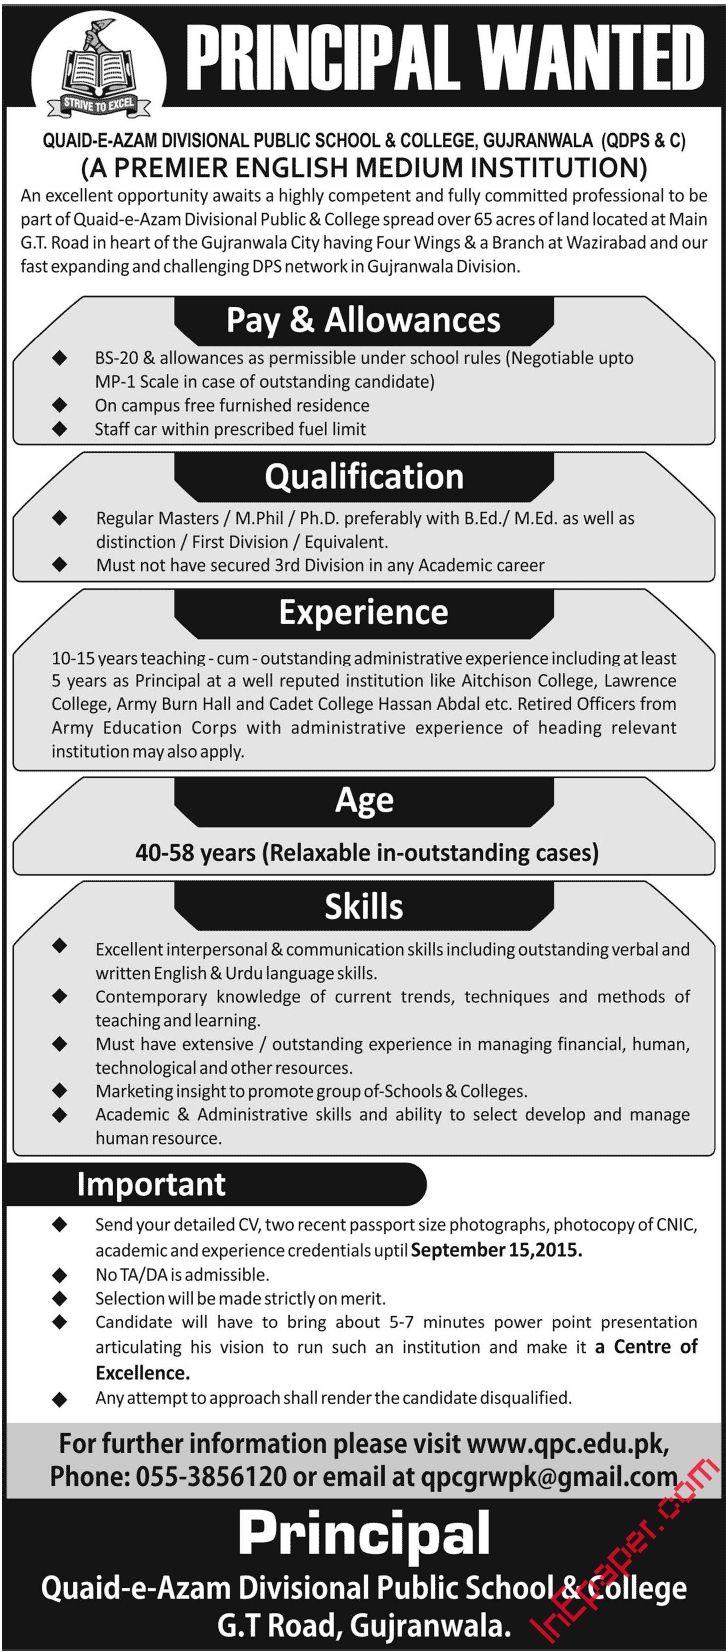 153 best images about Jobs on Pinterest | Dubai, Teacher jobs and ...